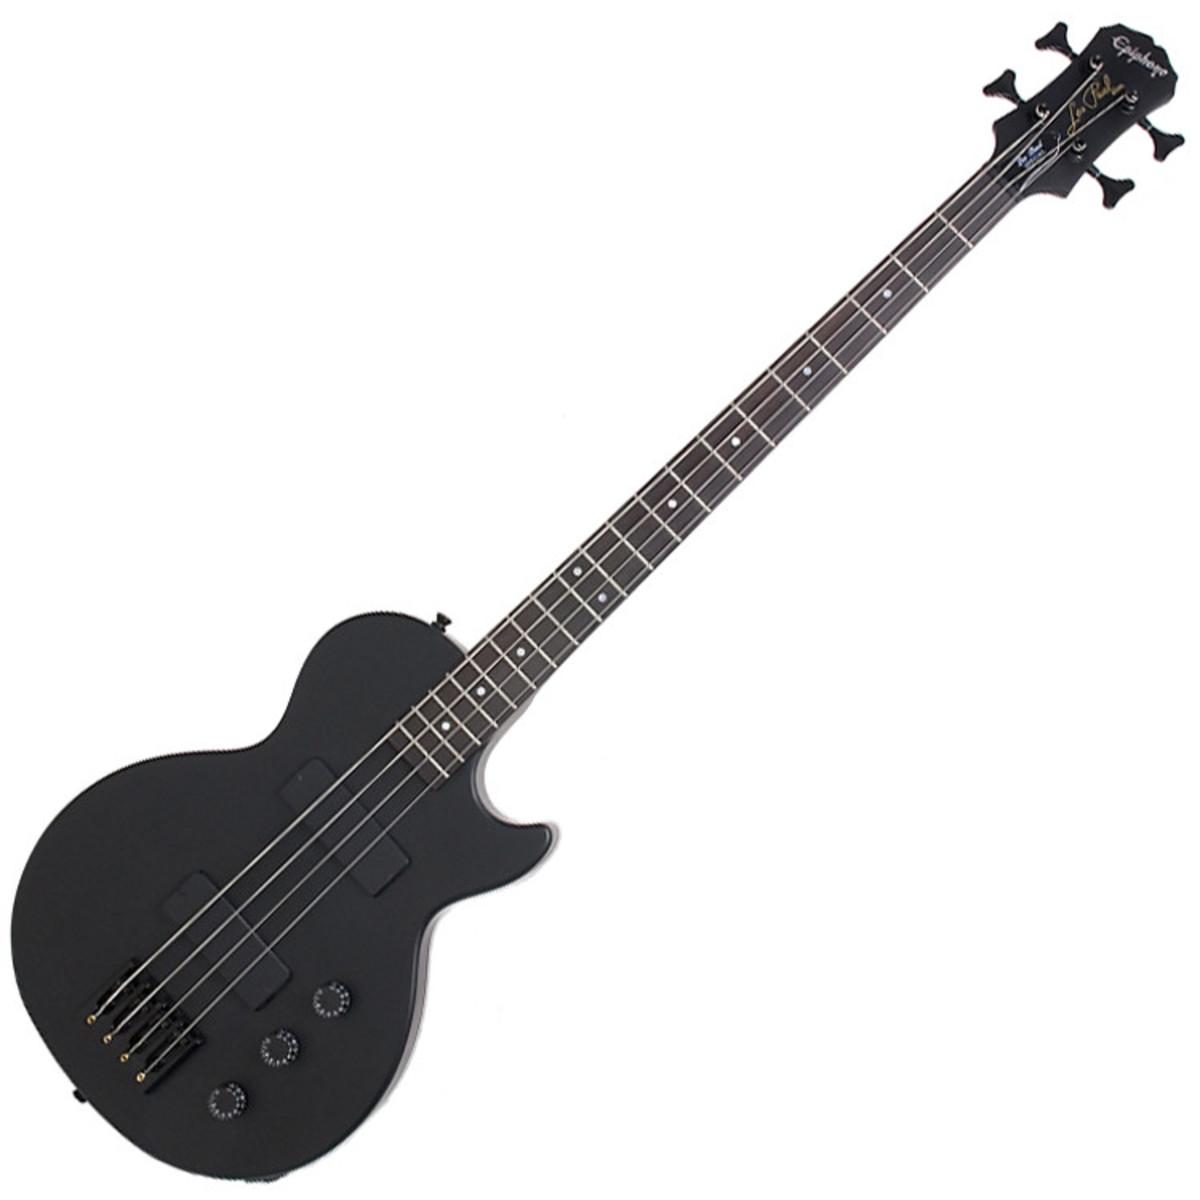 Epiphone Les Paul Special Bass : disc epiphone les paul special bass pitch black at gear4music ~ Hamham.info Haus und Dekorationen